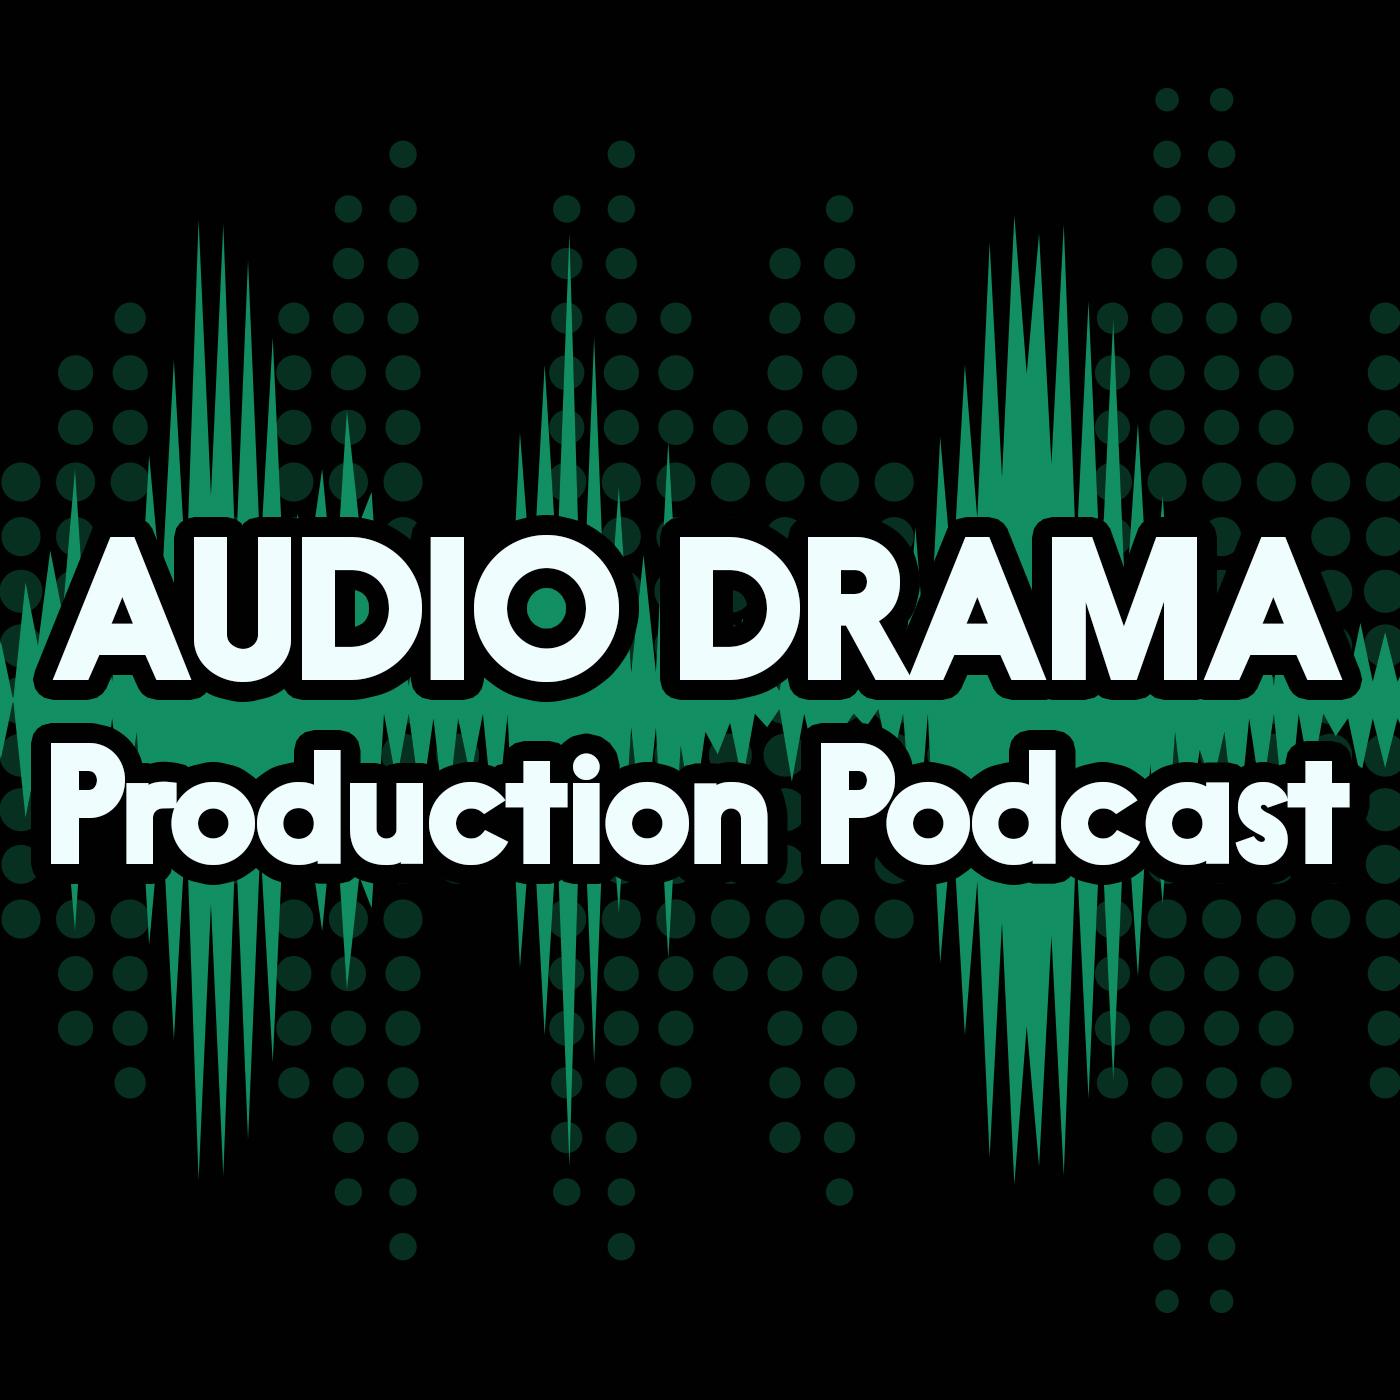 Audio Drama Production Podcast: How to make radio drama, radio plays, & audio fiction logo